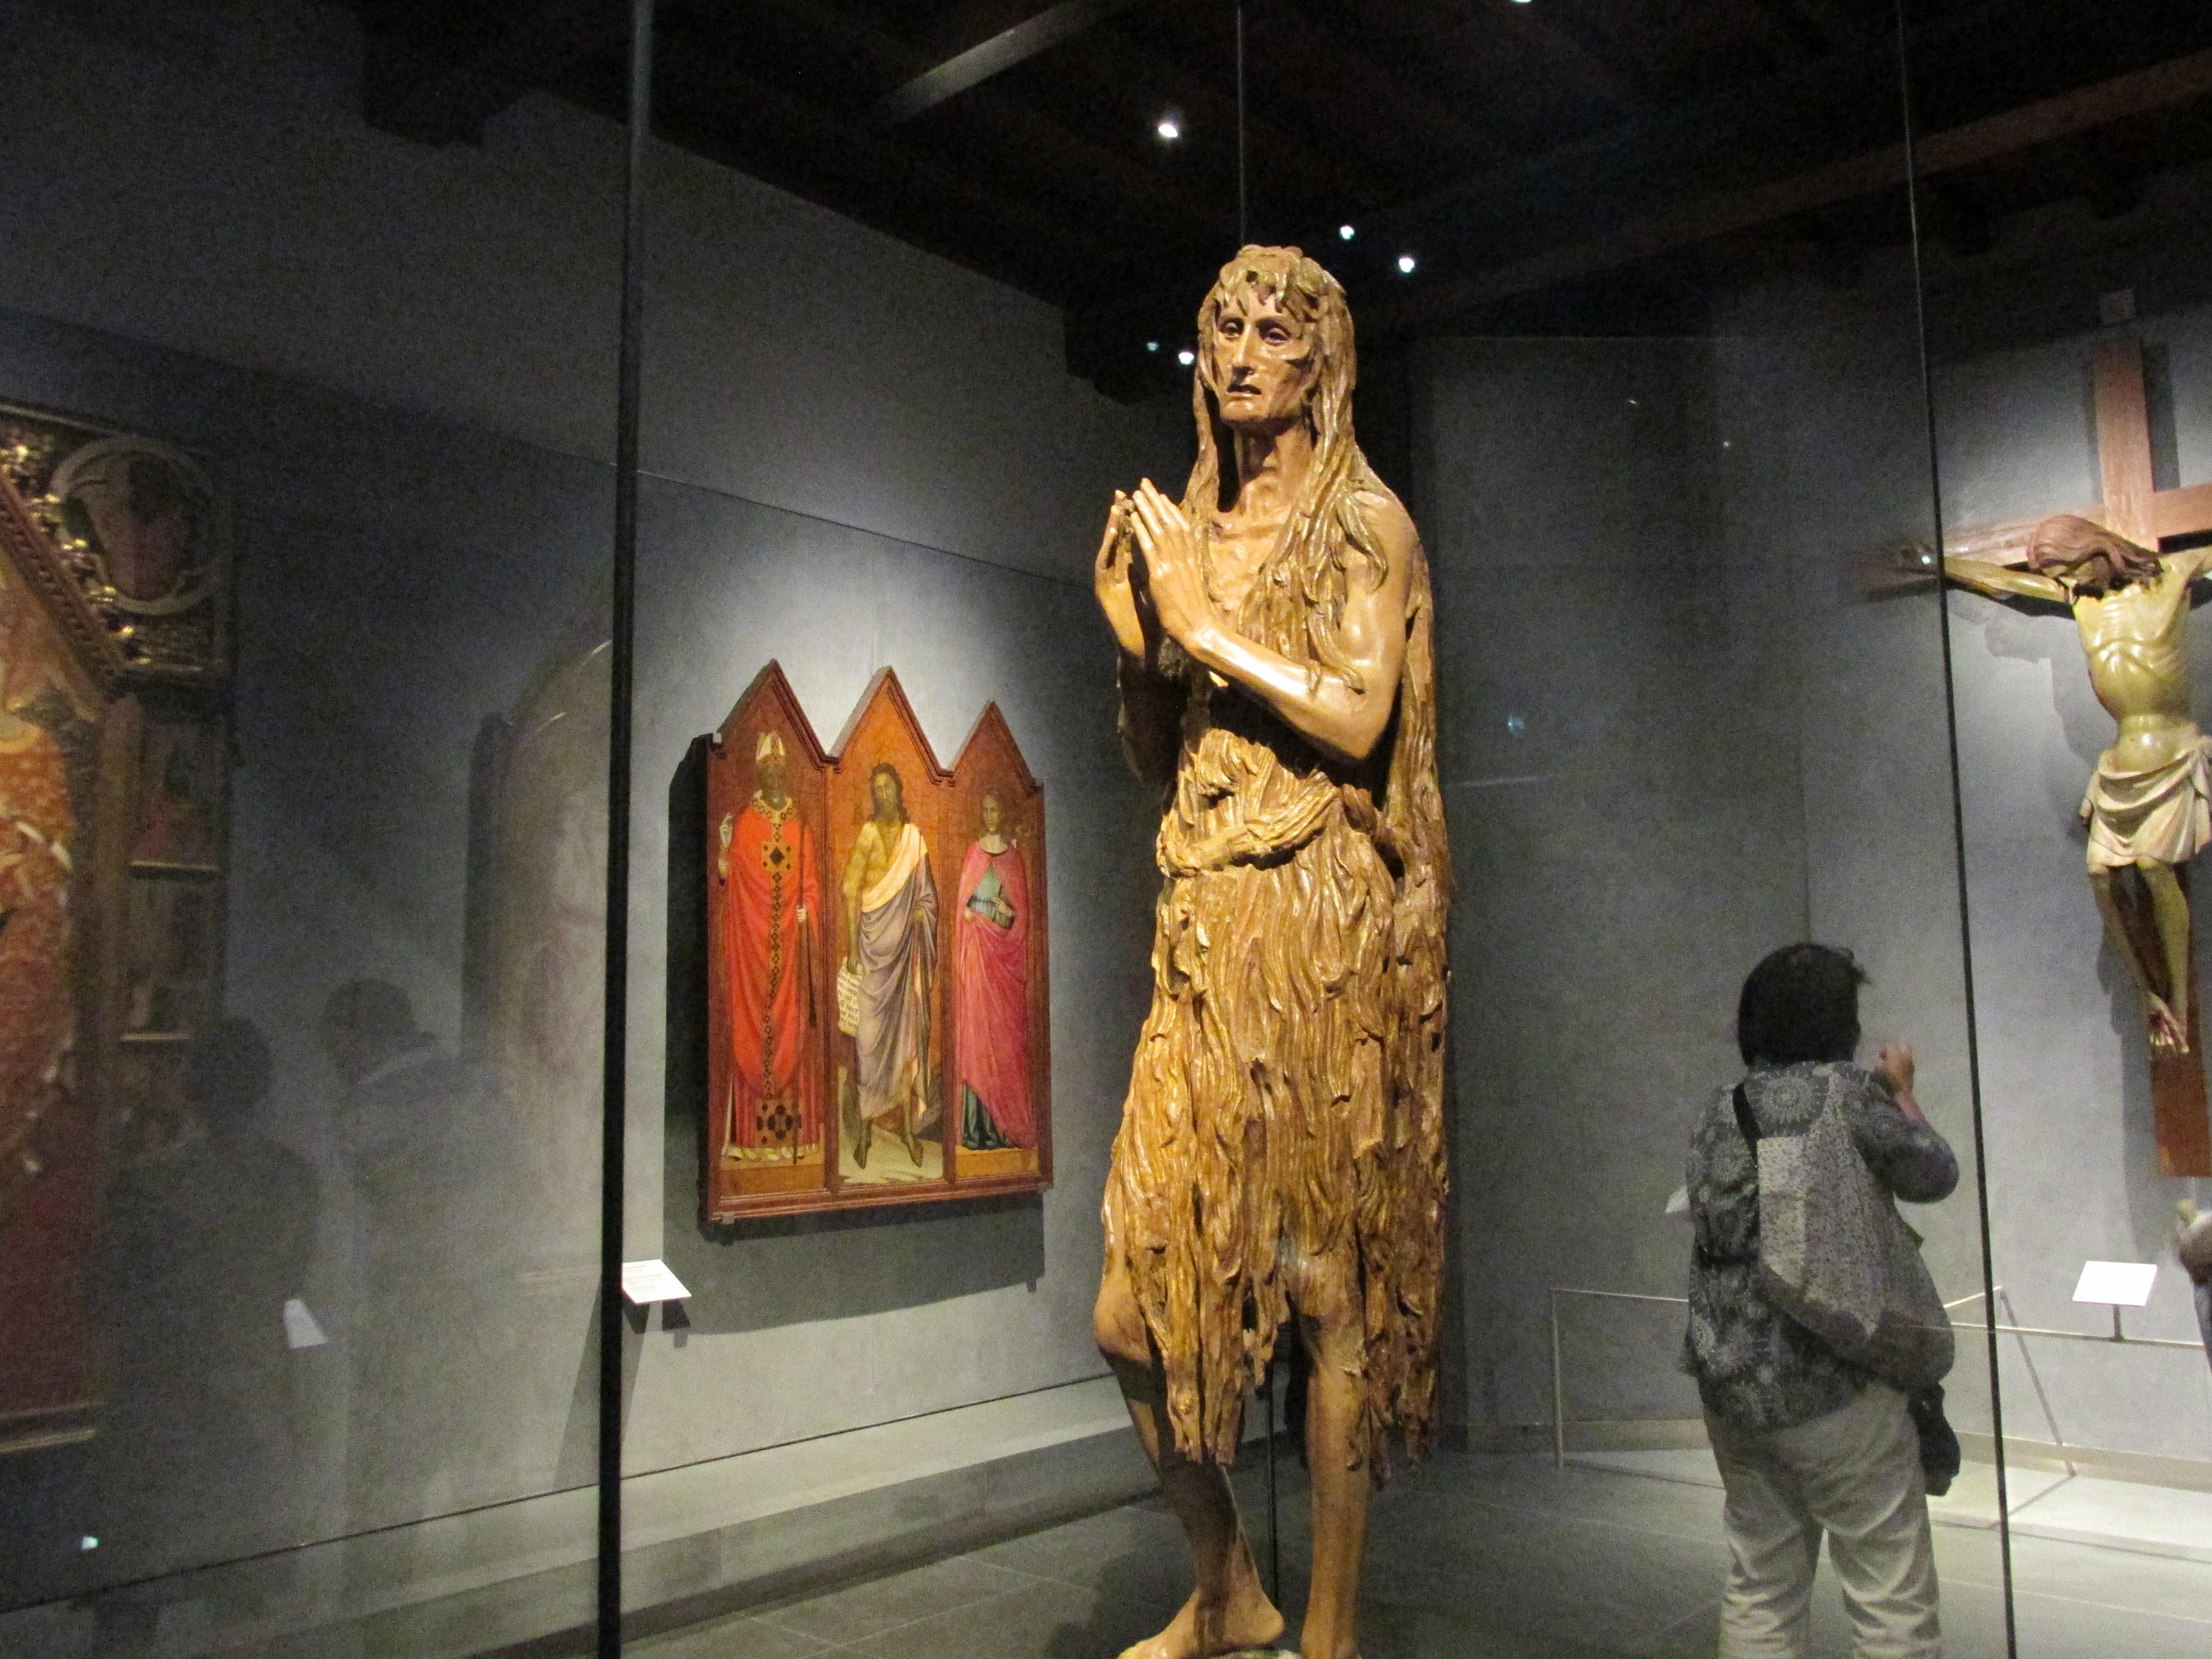 img 2831 - Visitando la Catedral Santa Maria del Fiore de Florencia I/III